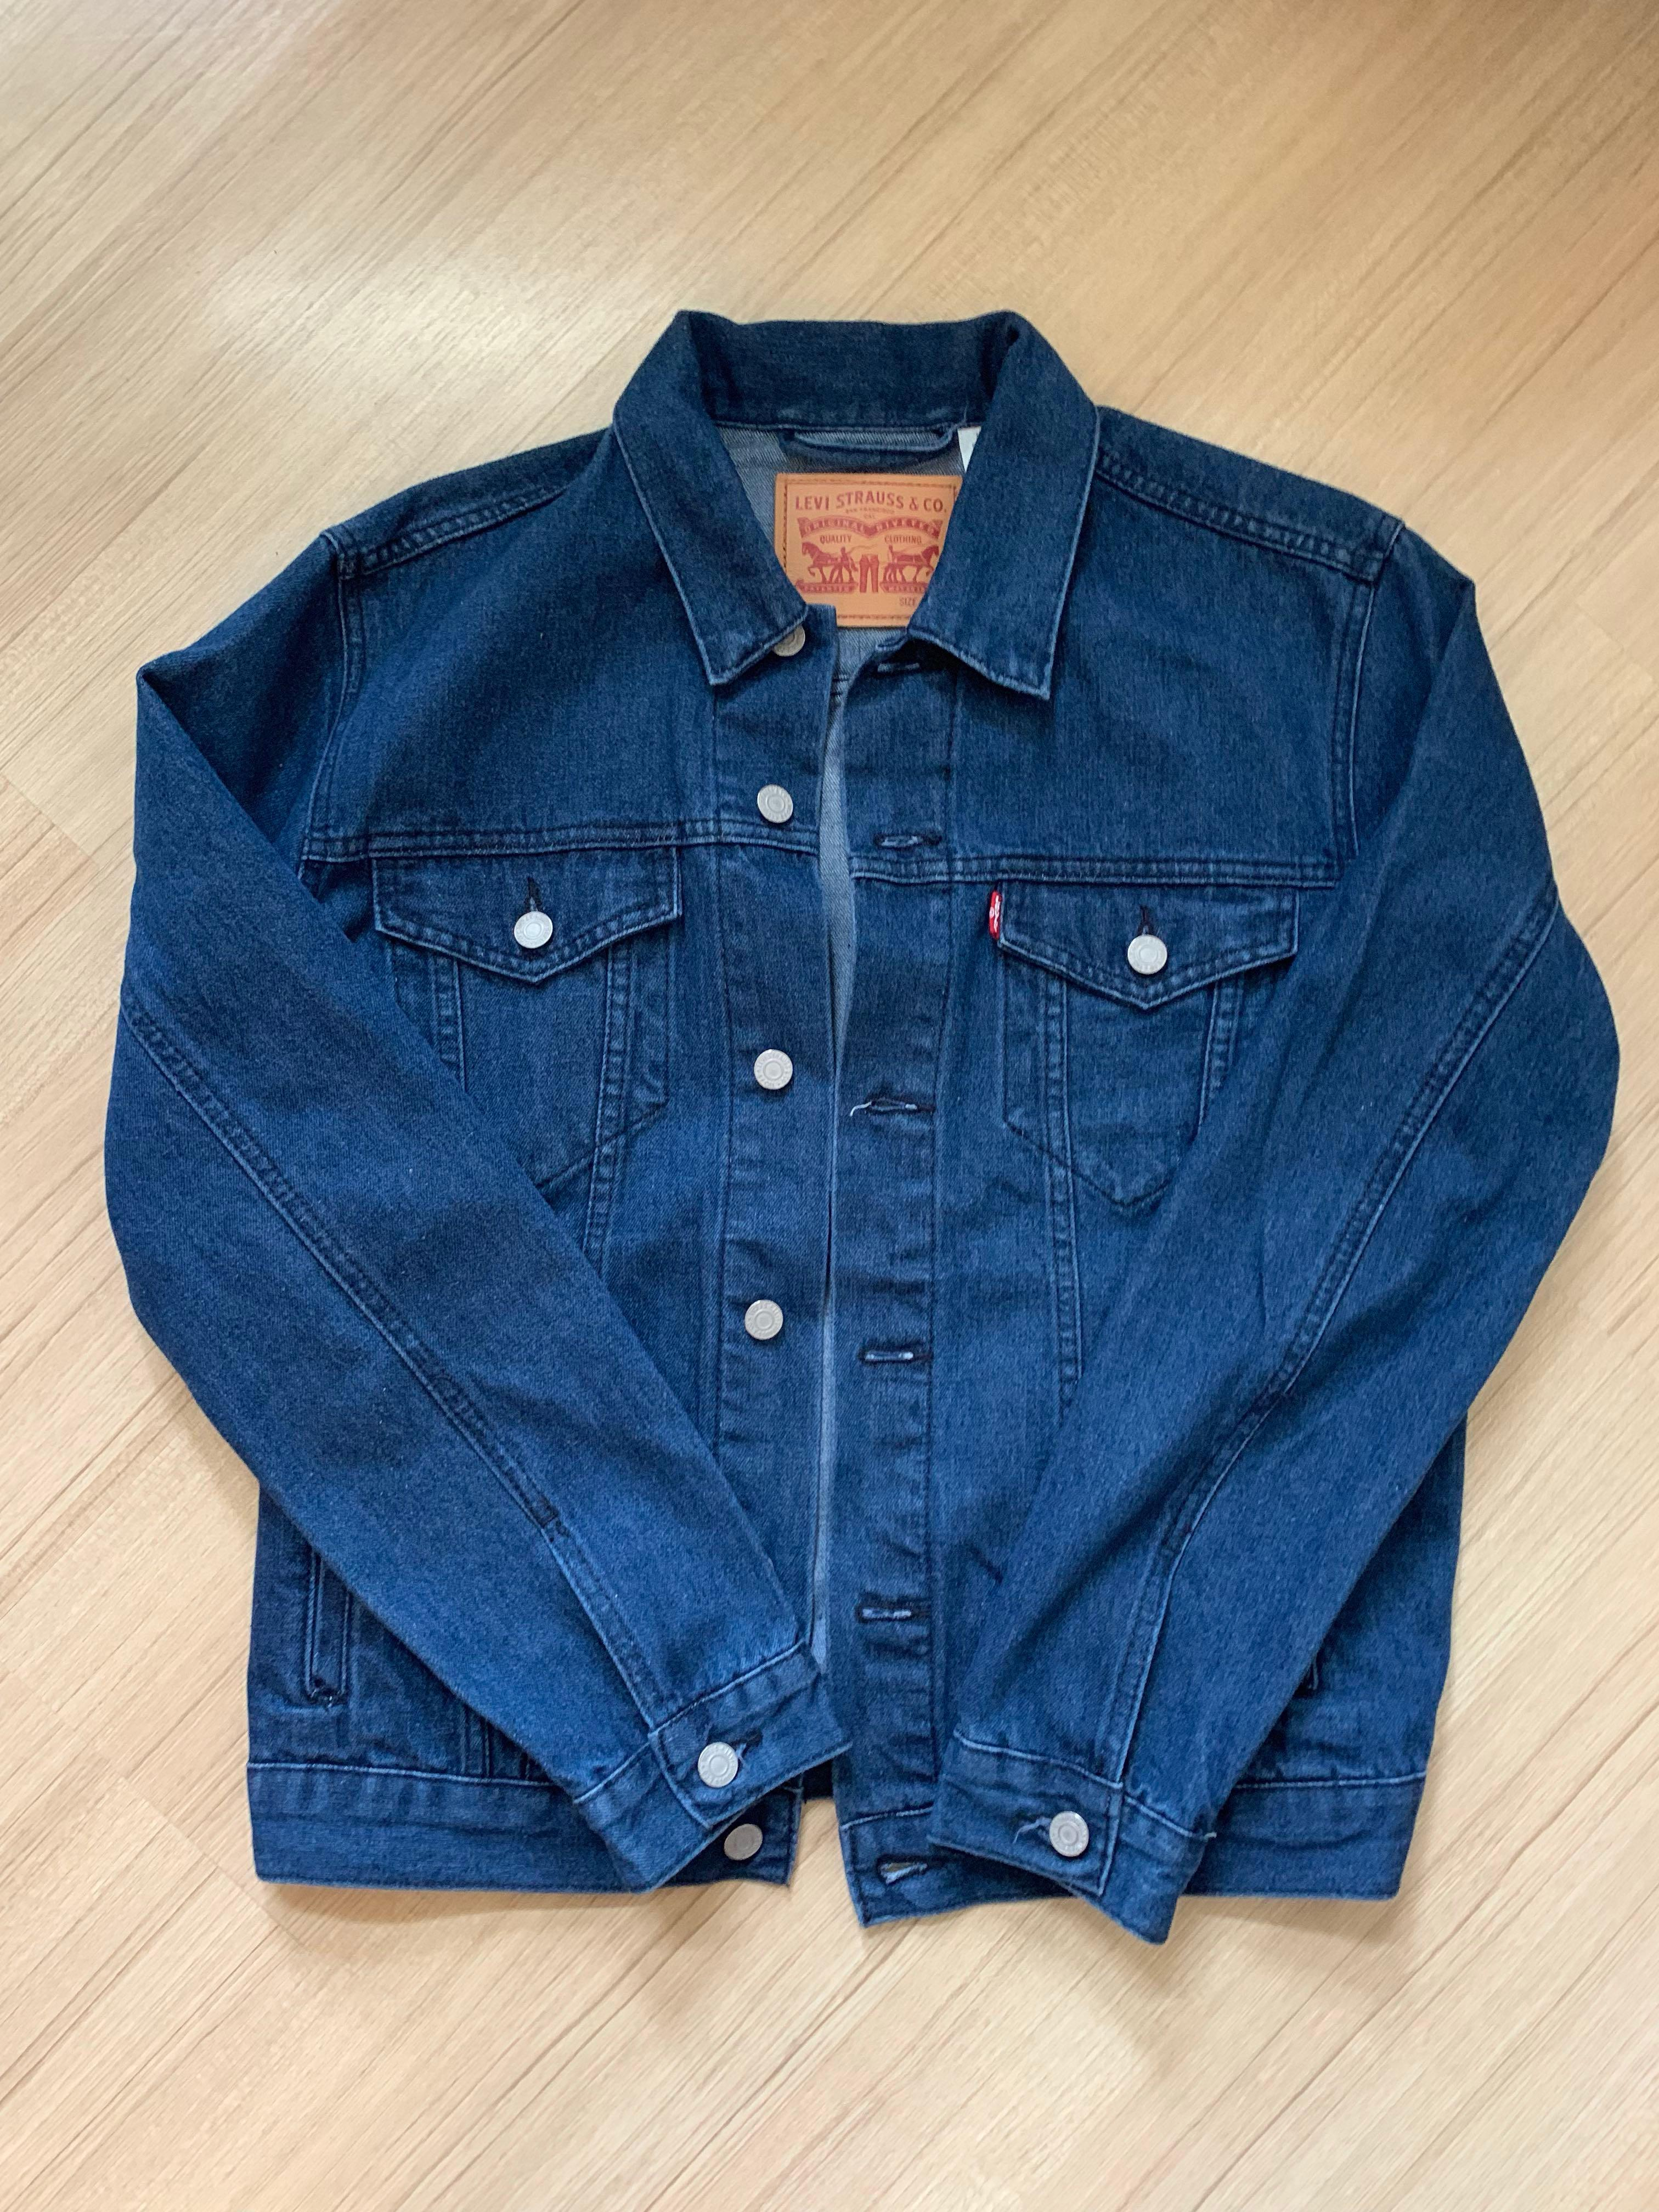 Levi's Blue Denim Jacket Size M